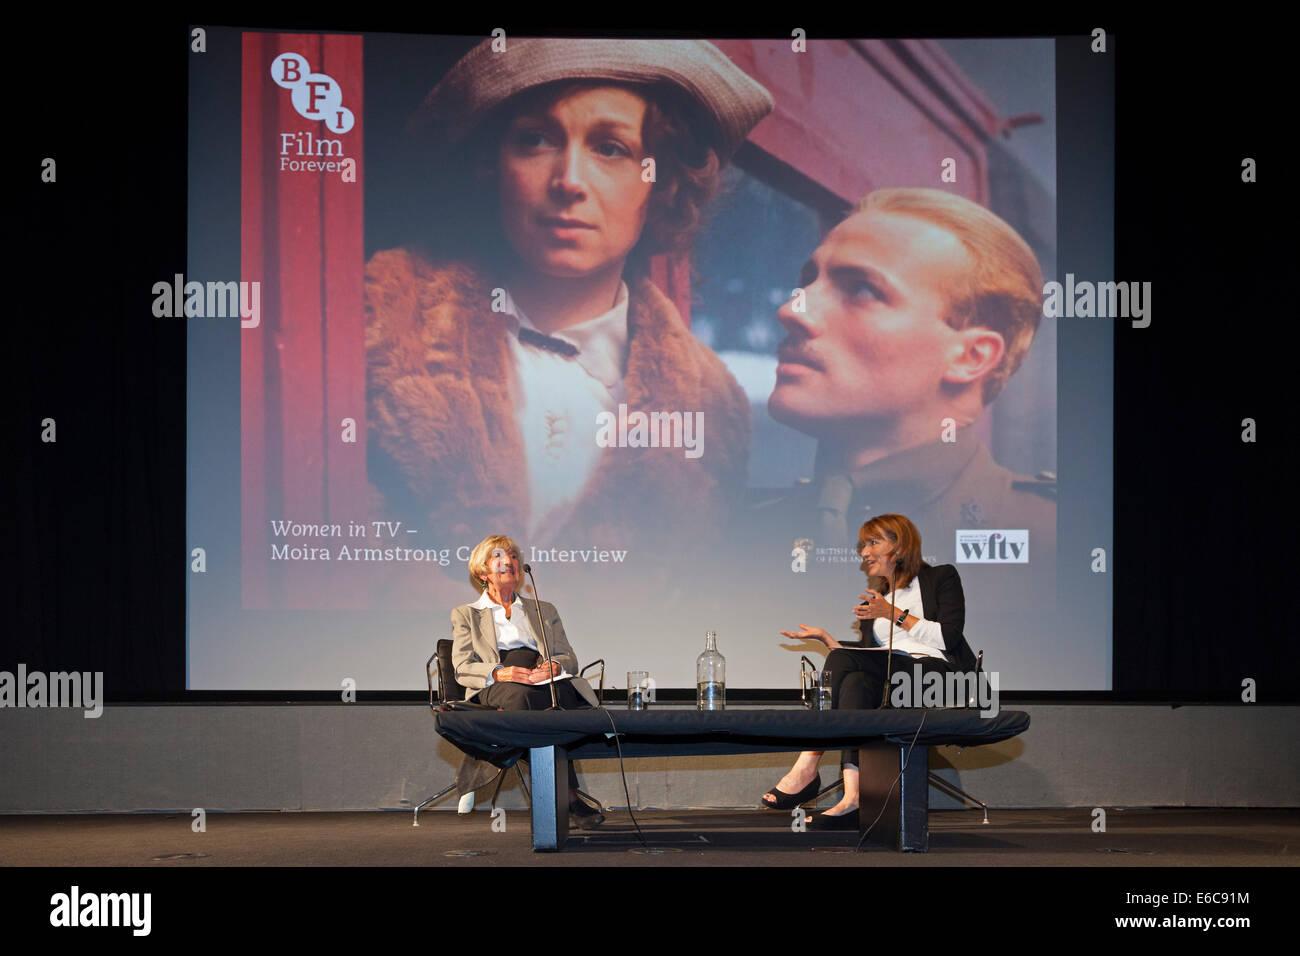 London, England, UK, 19 August 2014. Legendary BAFTA-Award winning multi-camera television drama director Moira - Stock Image